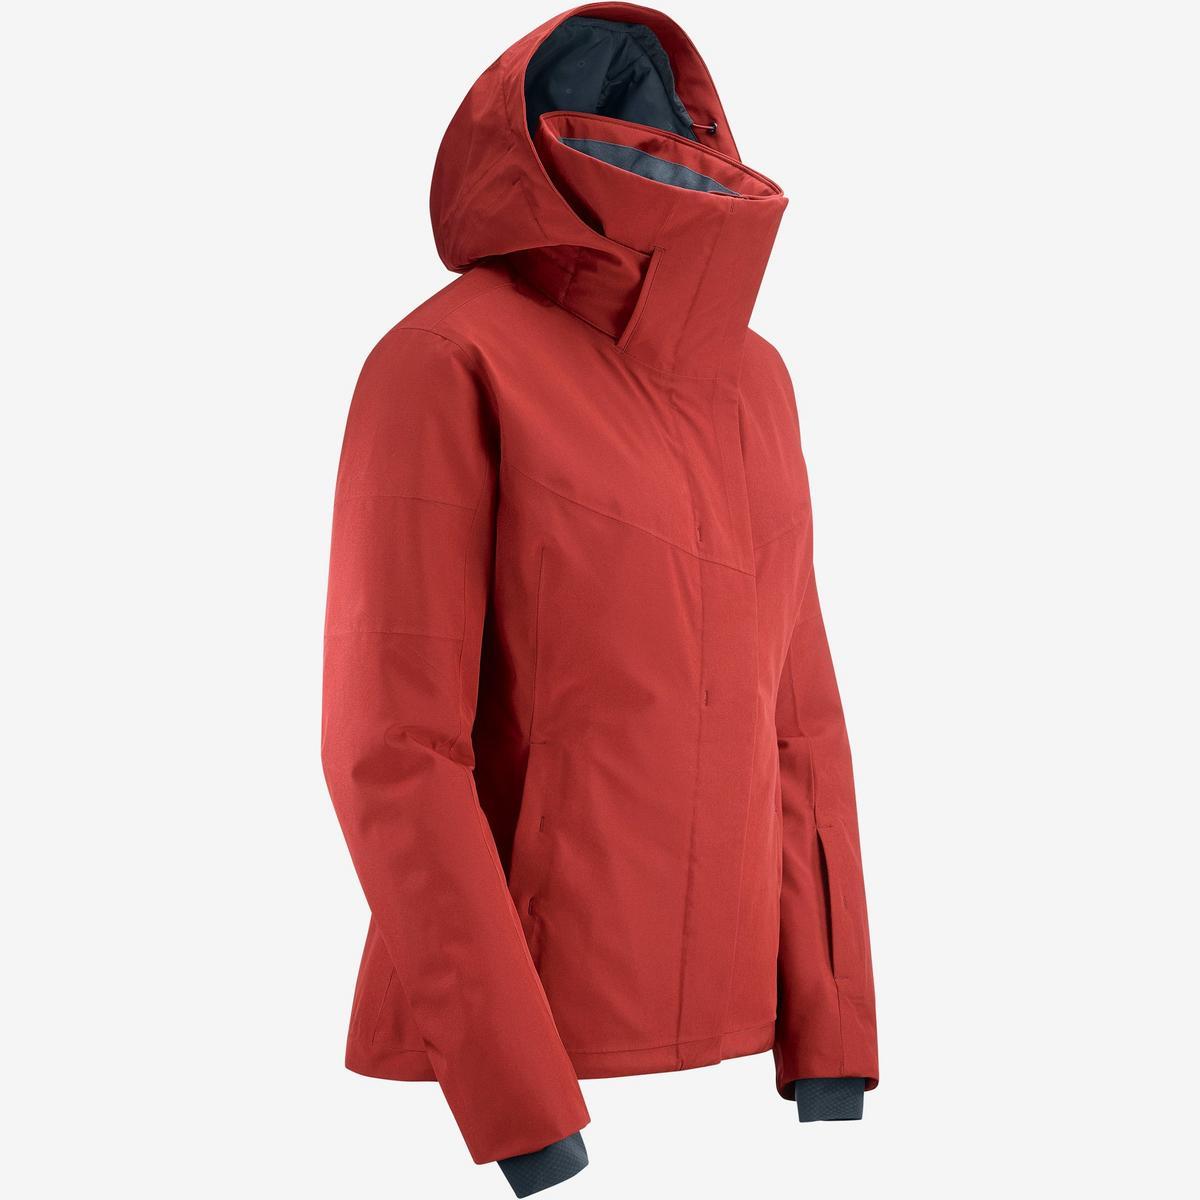 Salomon Women's Speed Jacket - Red Dahlia